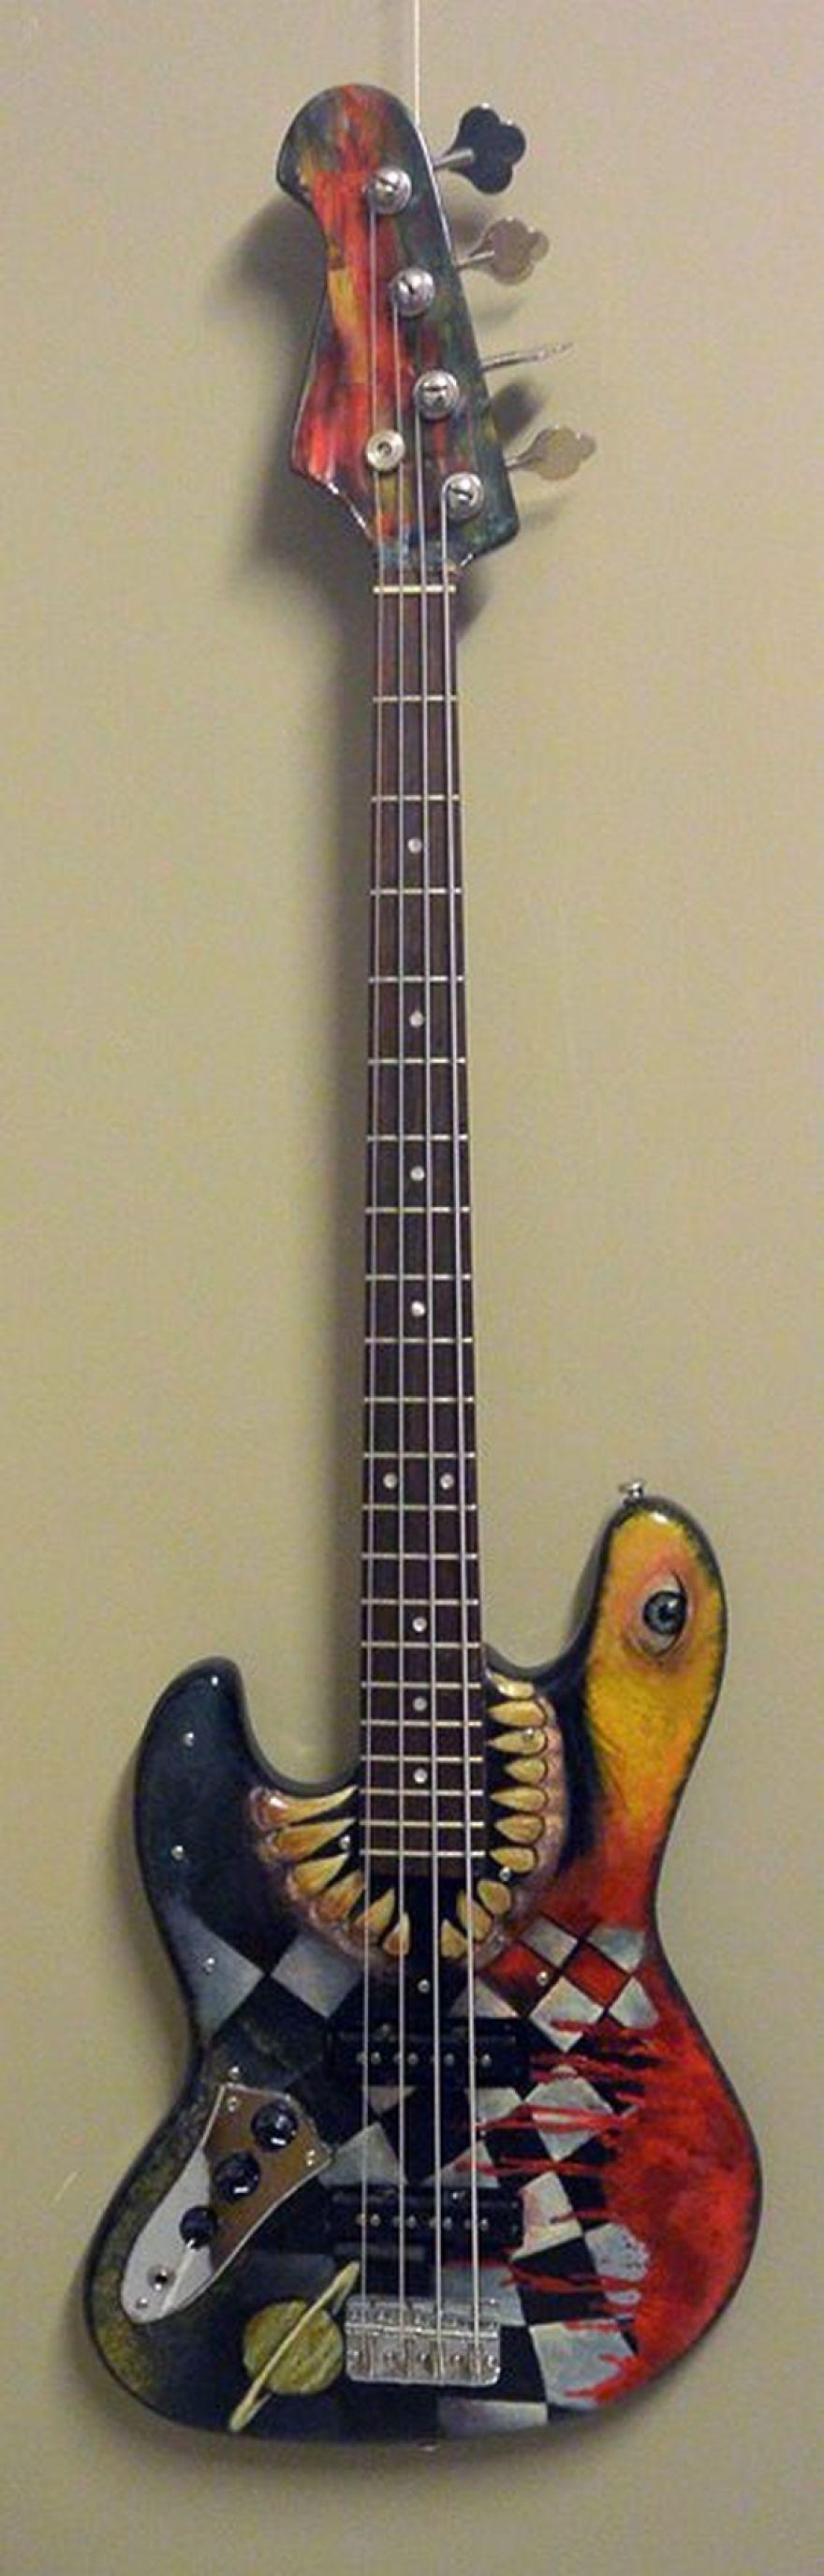 My Custom Painted Guitars